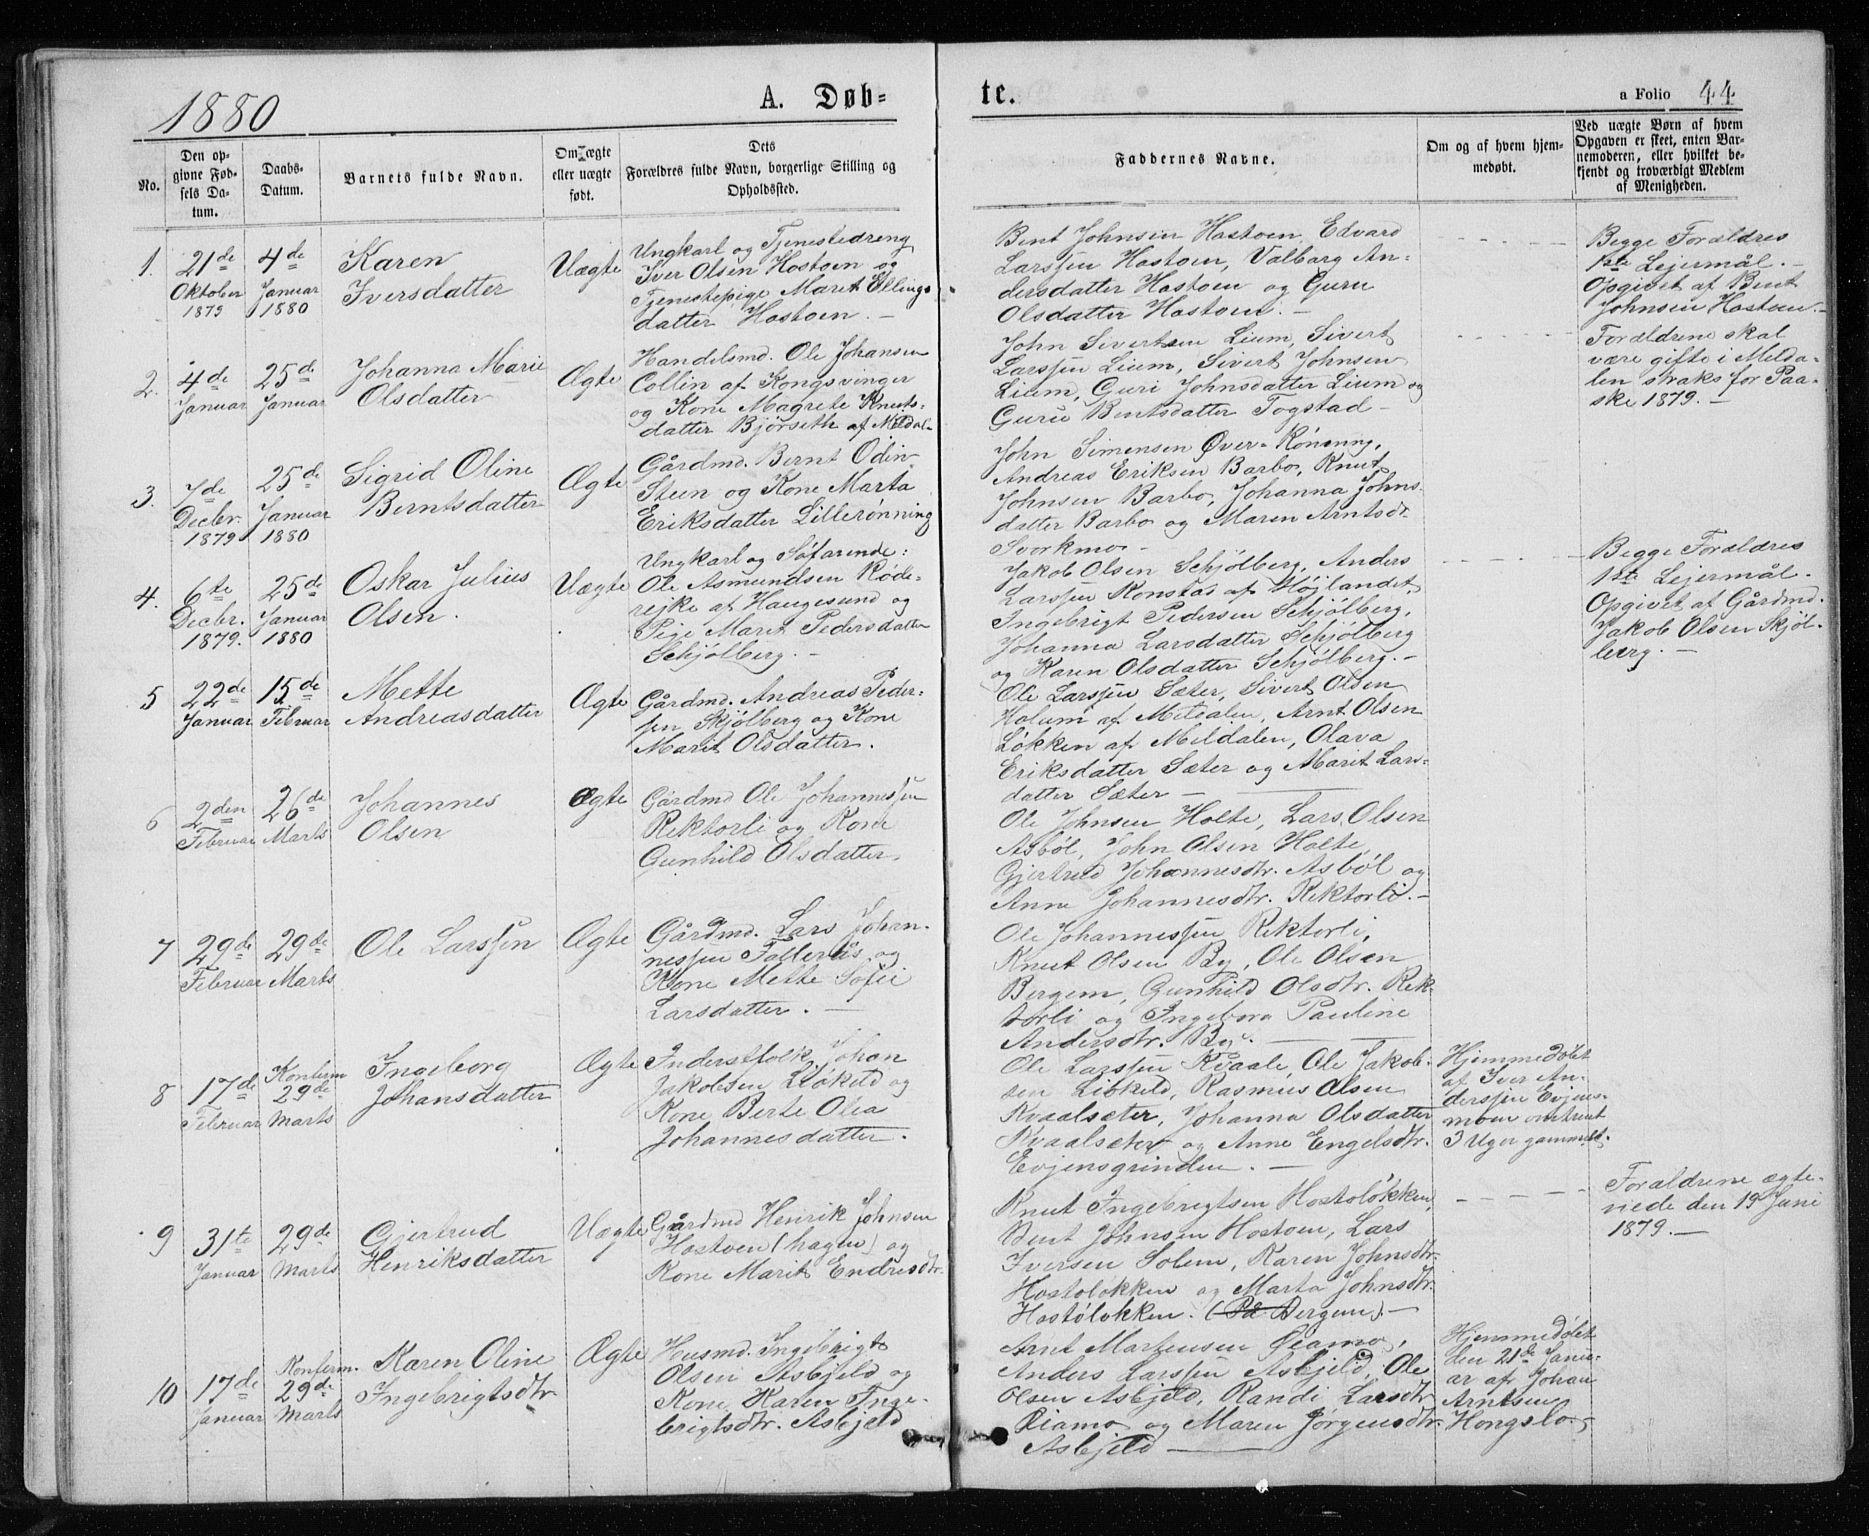 SAT, Ministerialprotokoller, klokkerbøker og fødselsregistre - Sør-Trøndelag, 671/L0843: Parish register (copy) no. 671C02, 1873-1892, p. 44